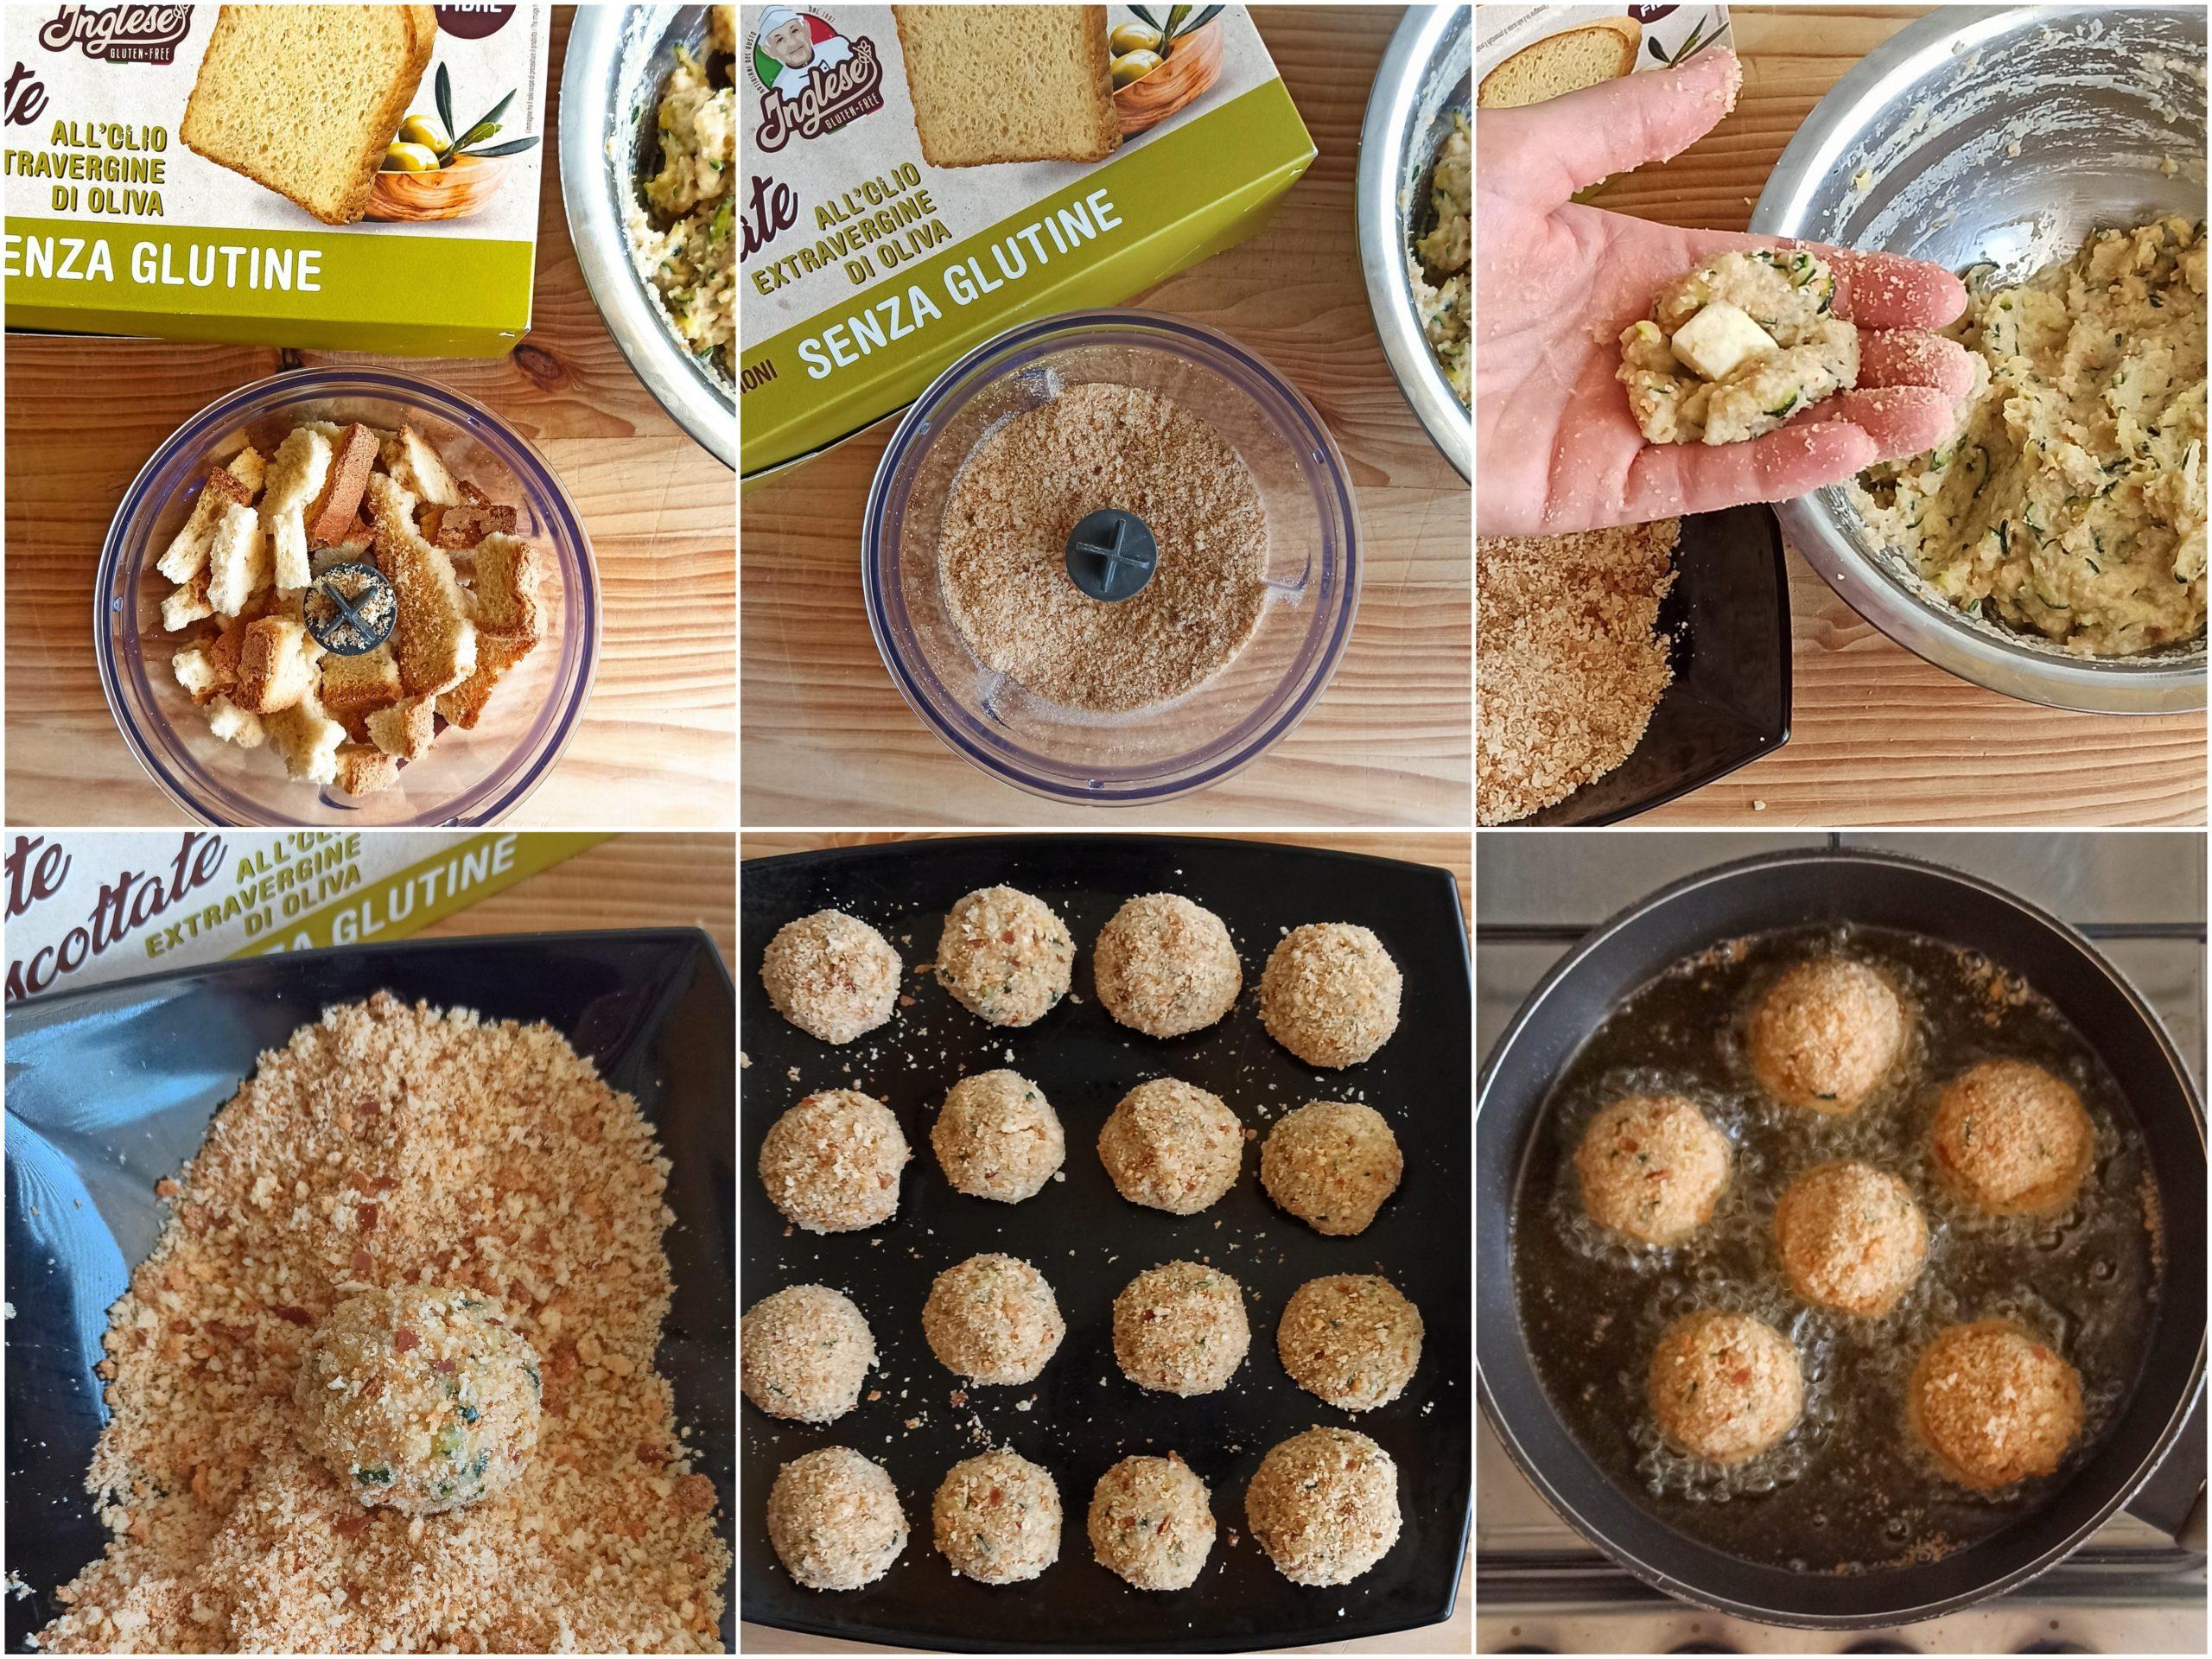 Polpettine di zucchine e patate senza glutine - La Cassata Celiaca